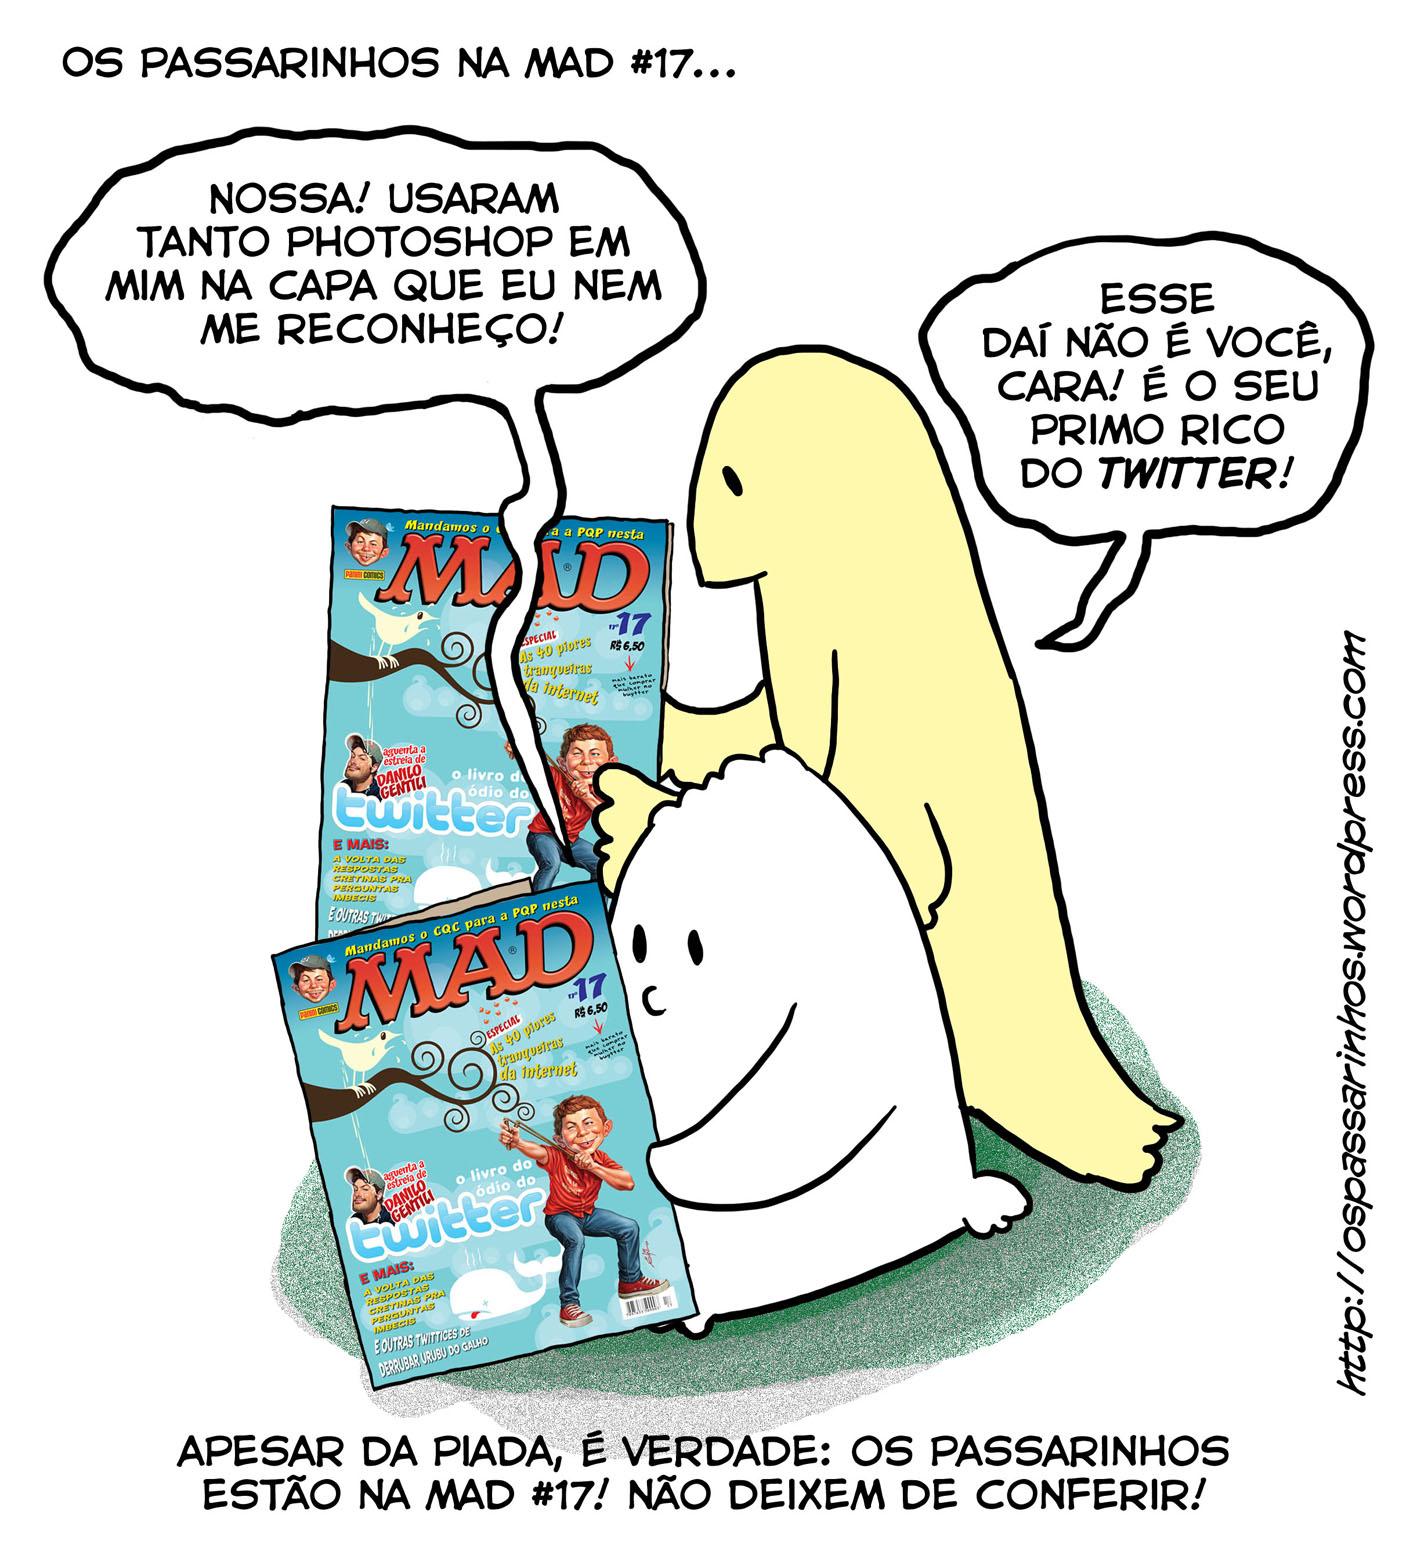 passarinhos_na_mad